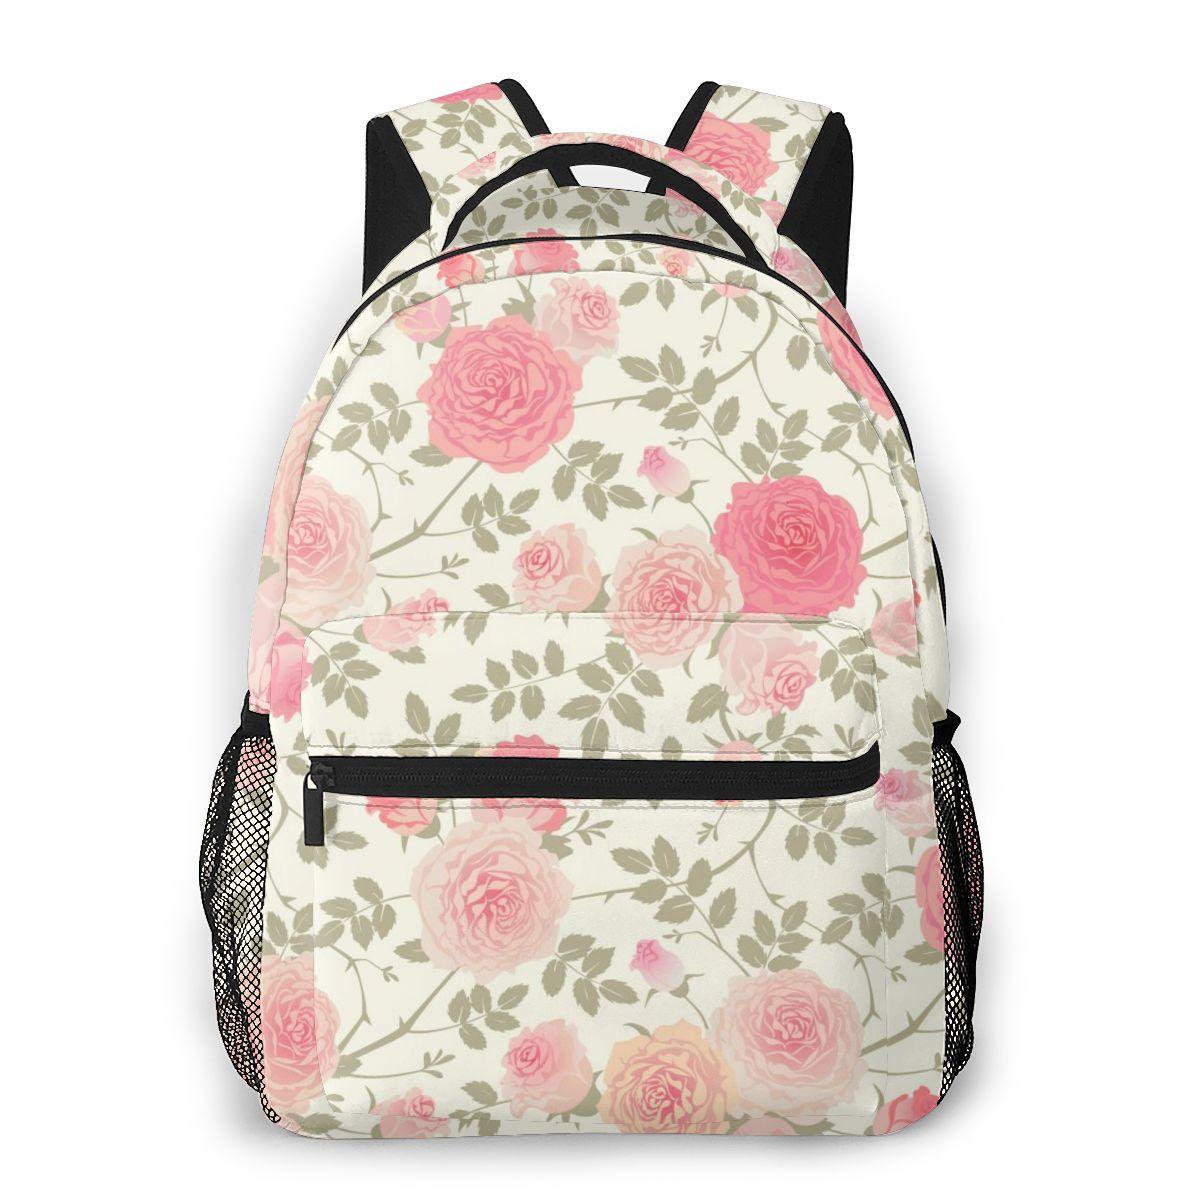 Bolsa de Ombro para Meninas Mochila Feminina Adolescentes Rosa Flores Bagpack Feminino Senhoras Escolar